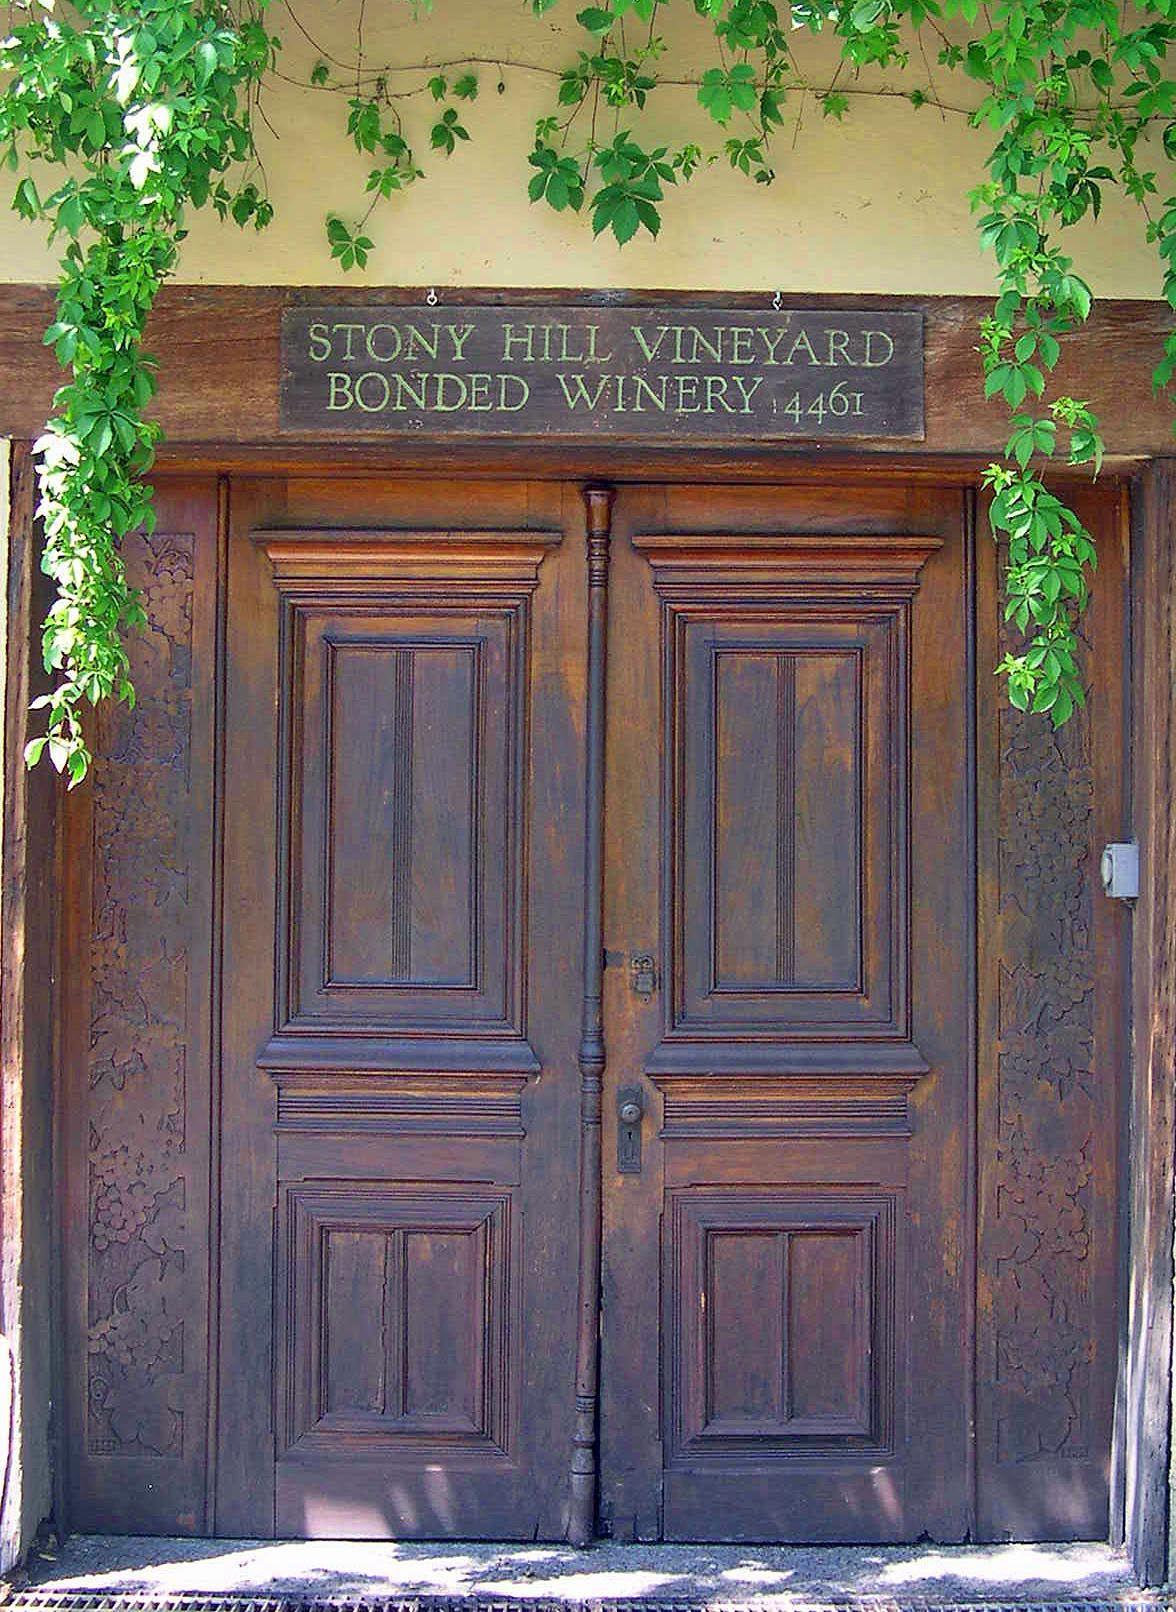 FileWinery Doors of Stony Hill Vineyard.jpg & File:Winery Doors of Stony Hill Vineyard.jpg | Winery Finery ...